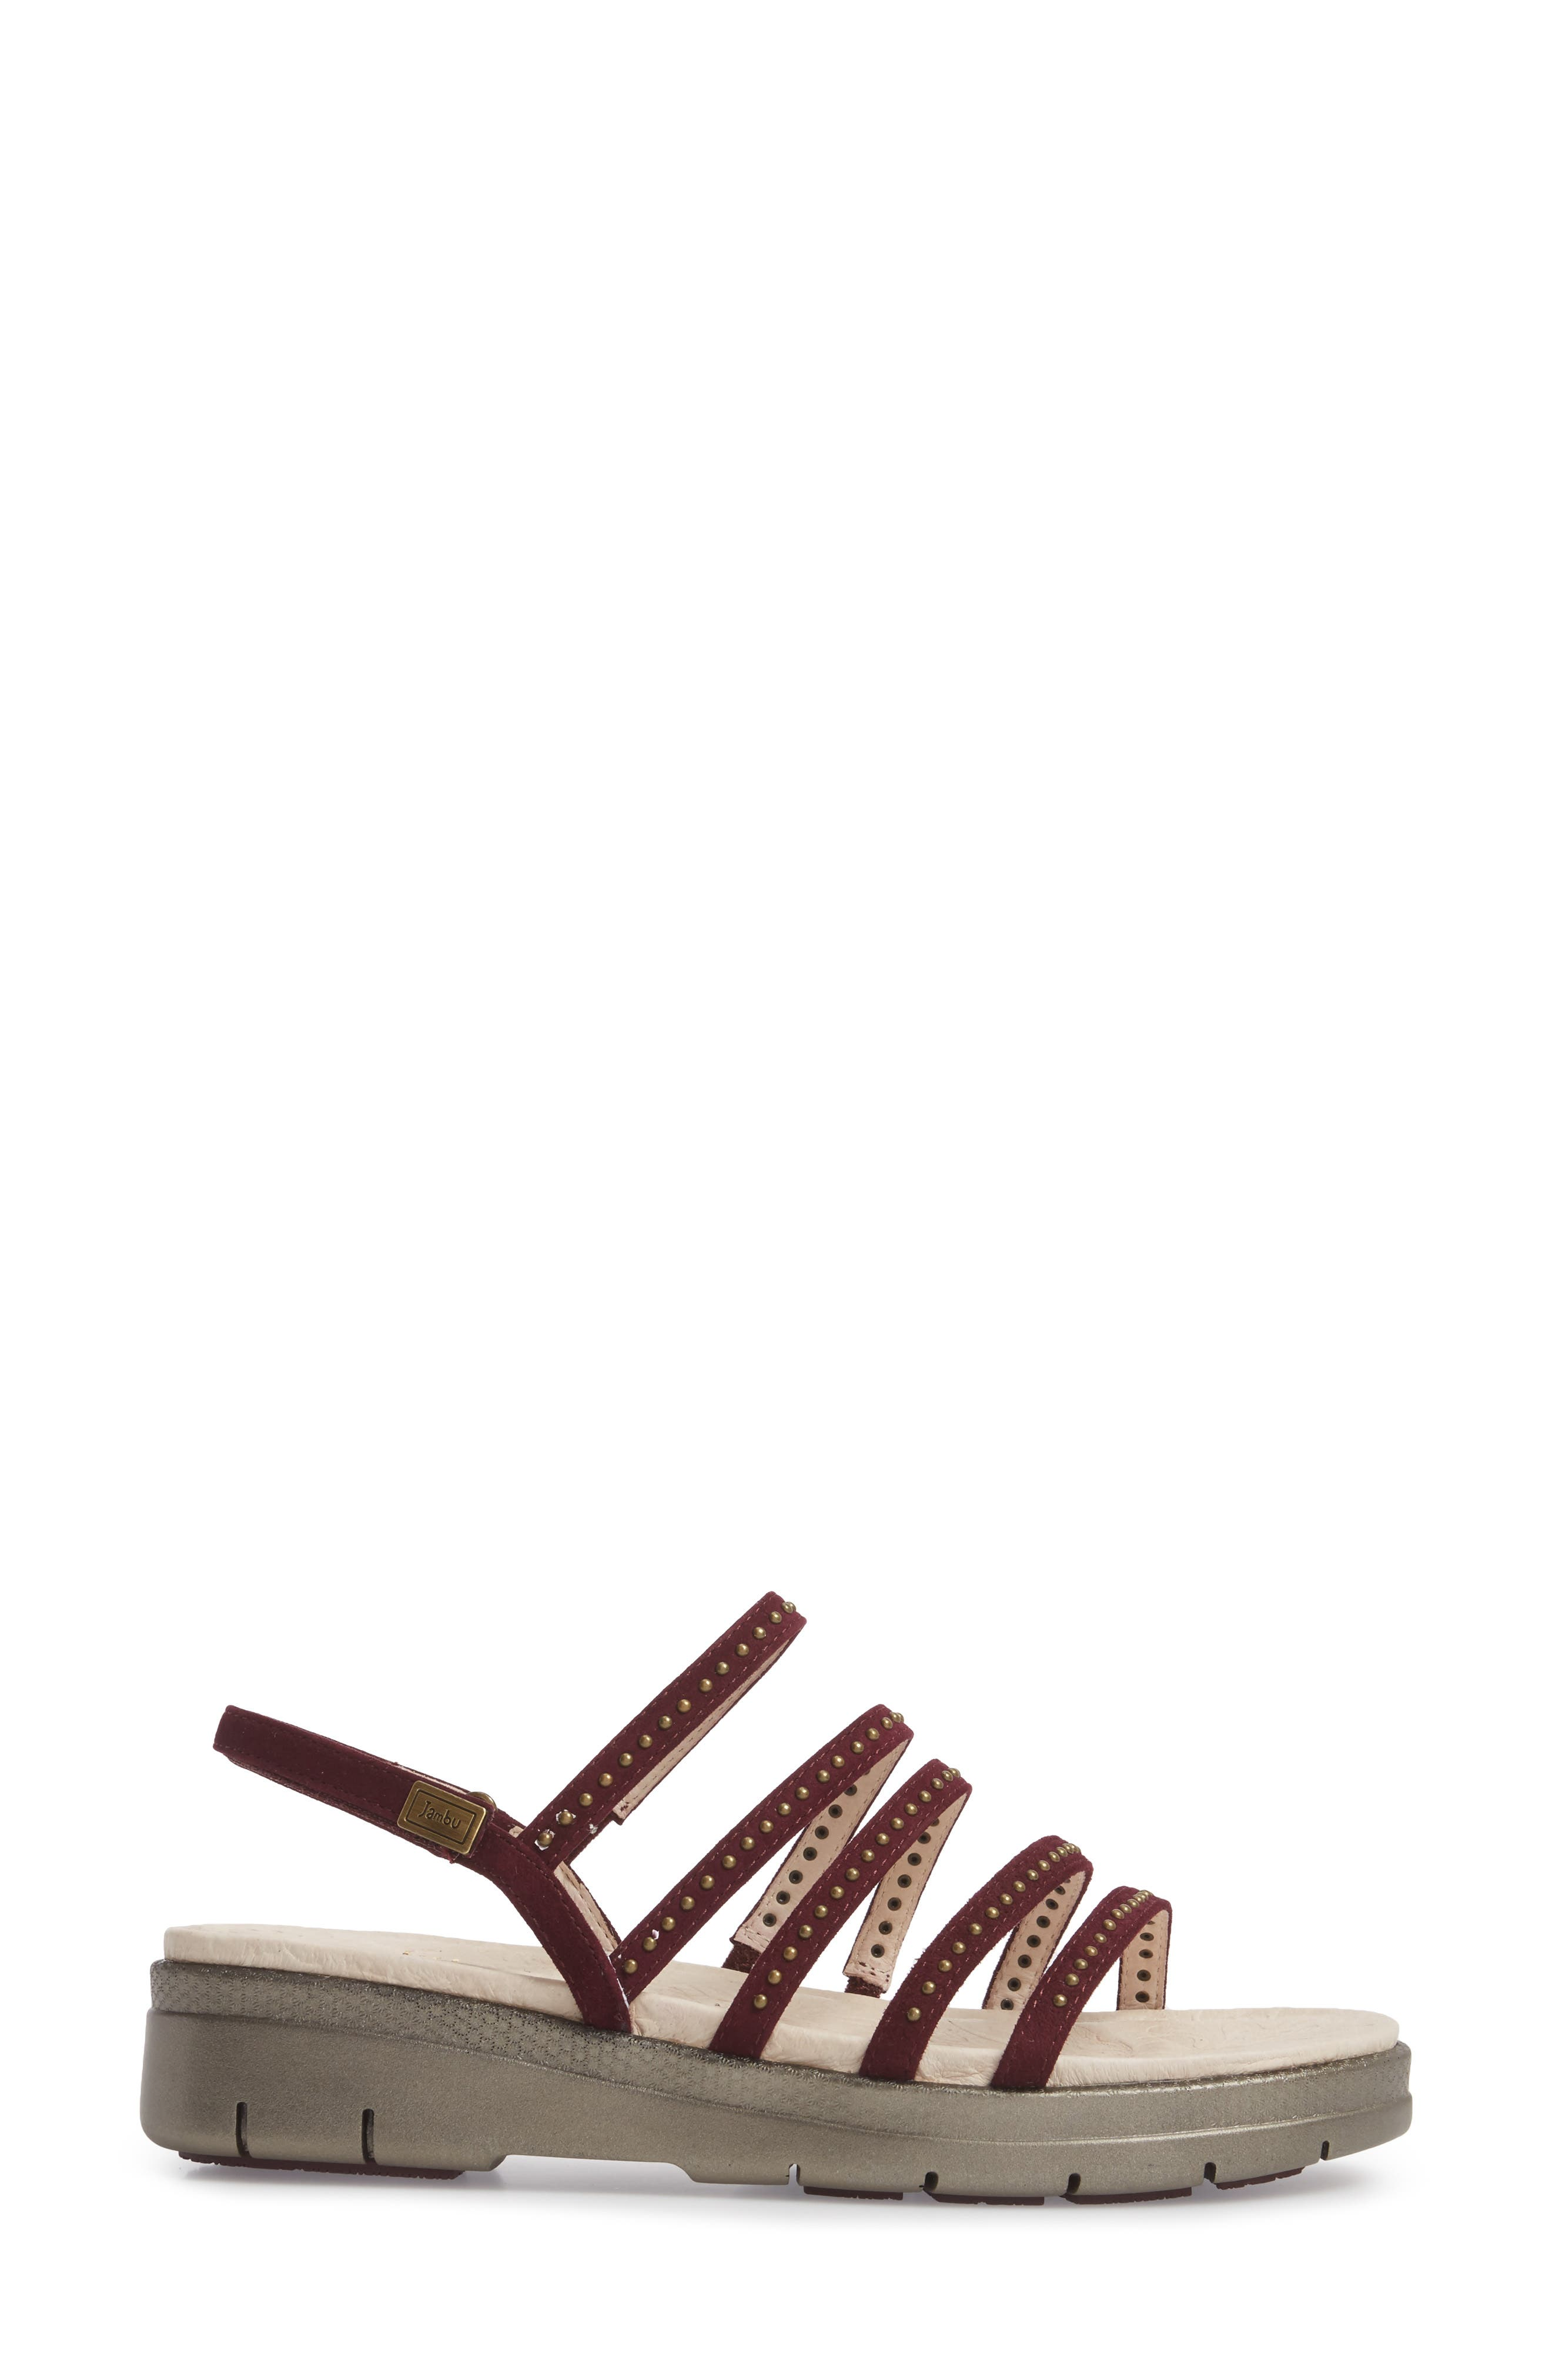 Elegance Studded Strappy Sandal,                             Alternate thumbnail 3, color,                             WINE SUEDE